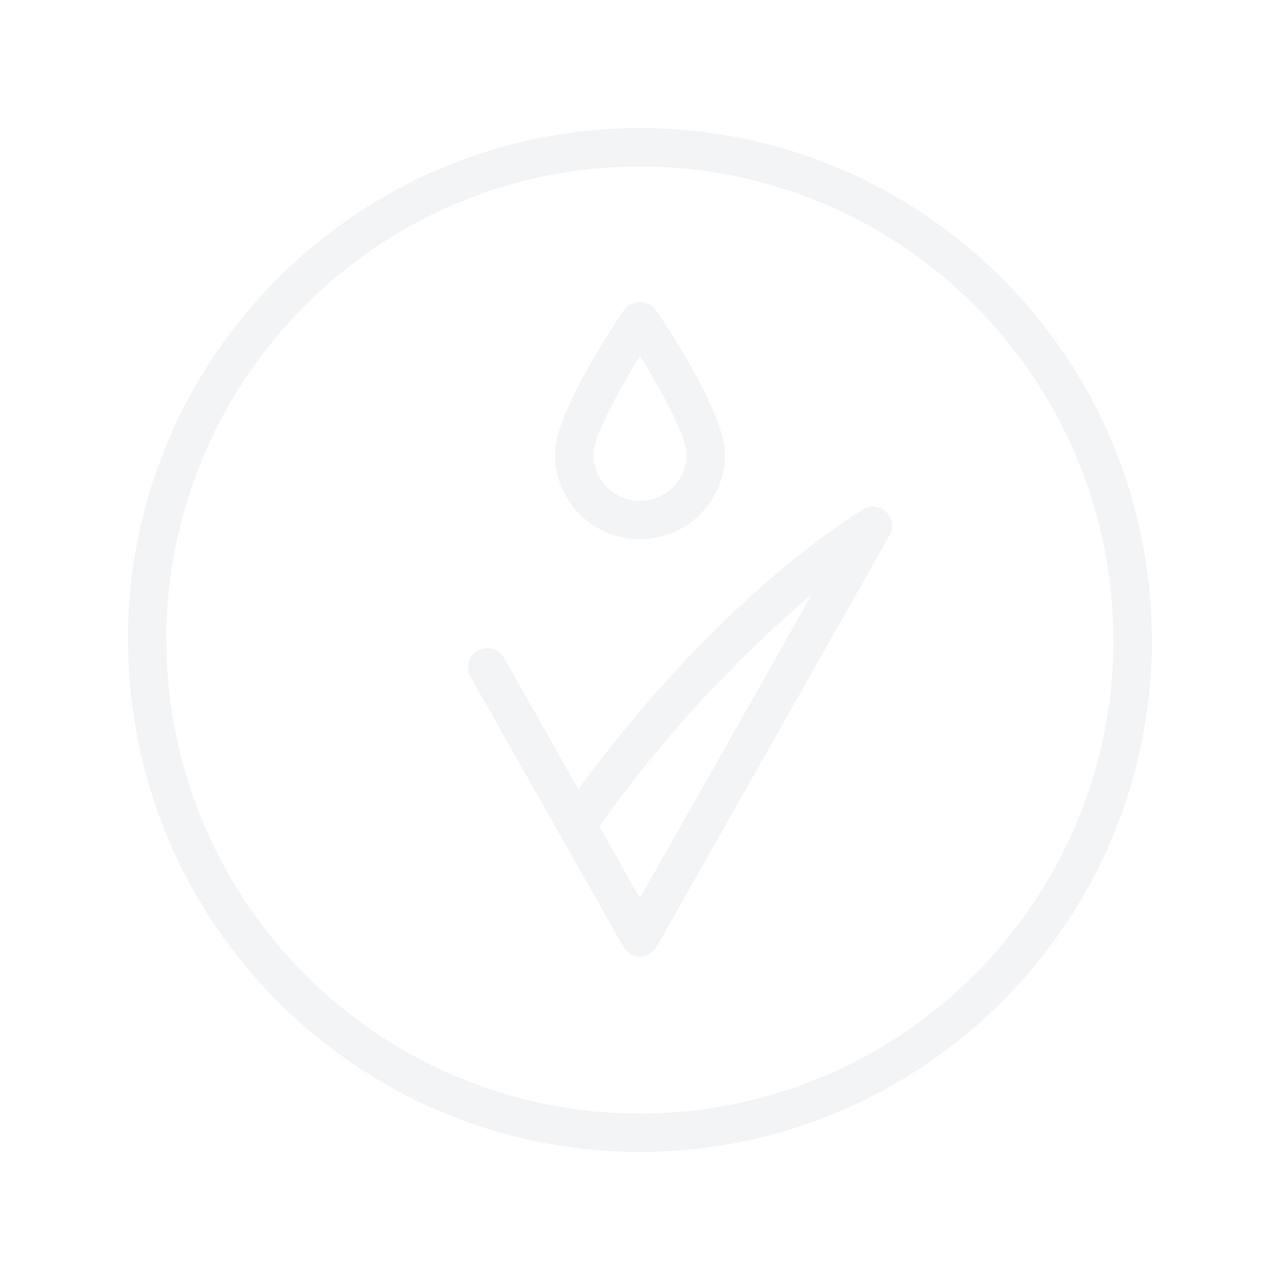 LIERAC Homme 24h Roll-On Deodorant 50ml